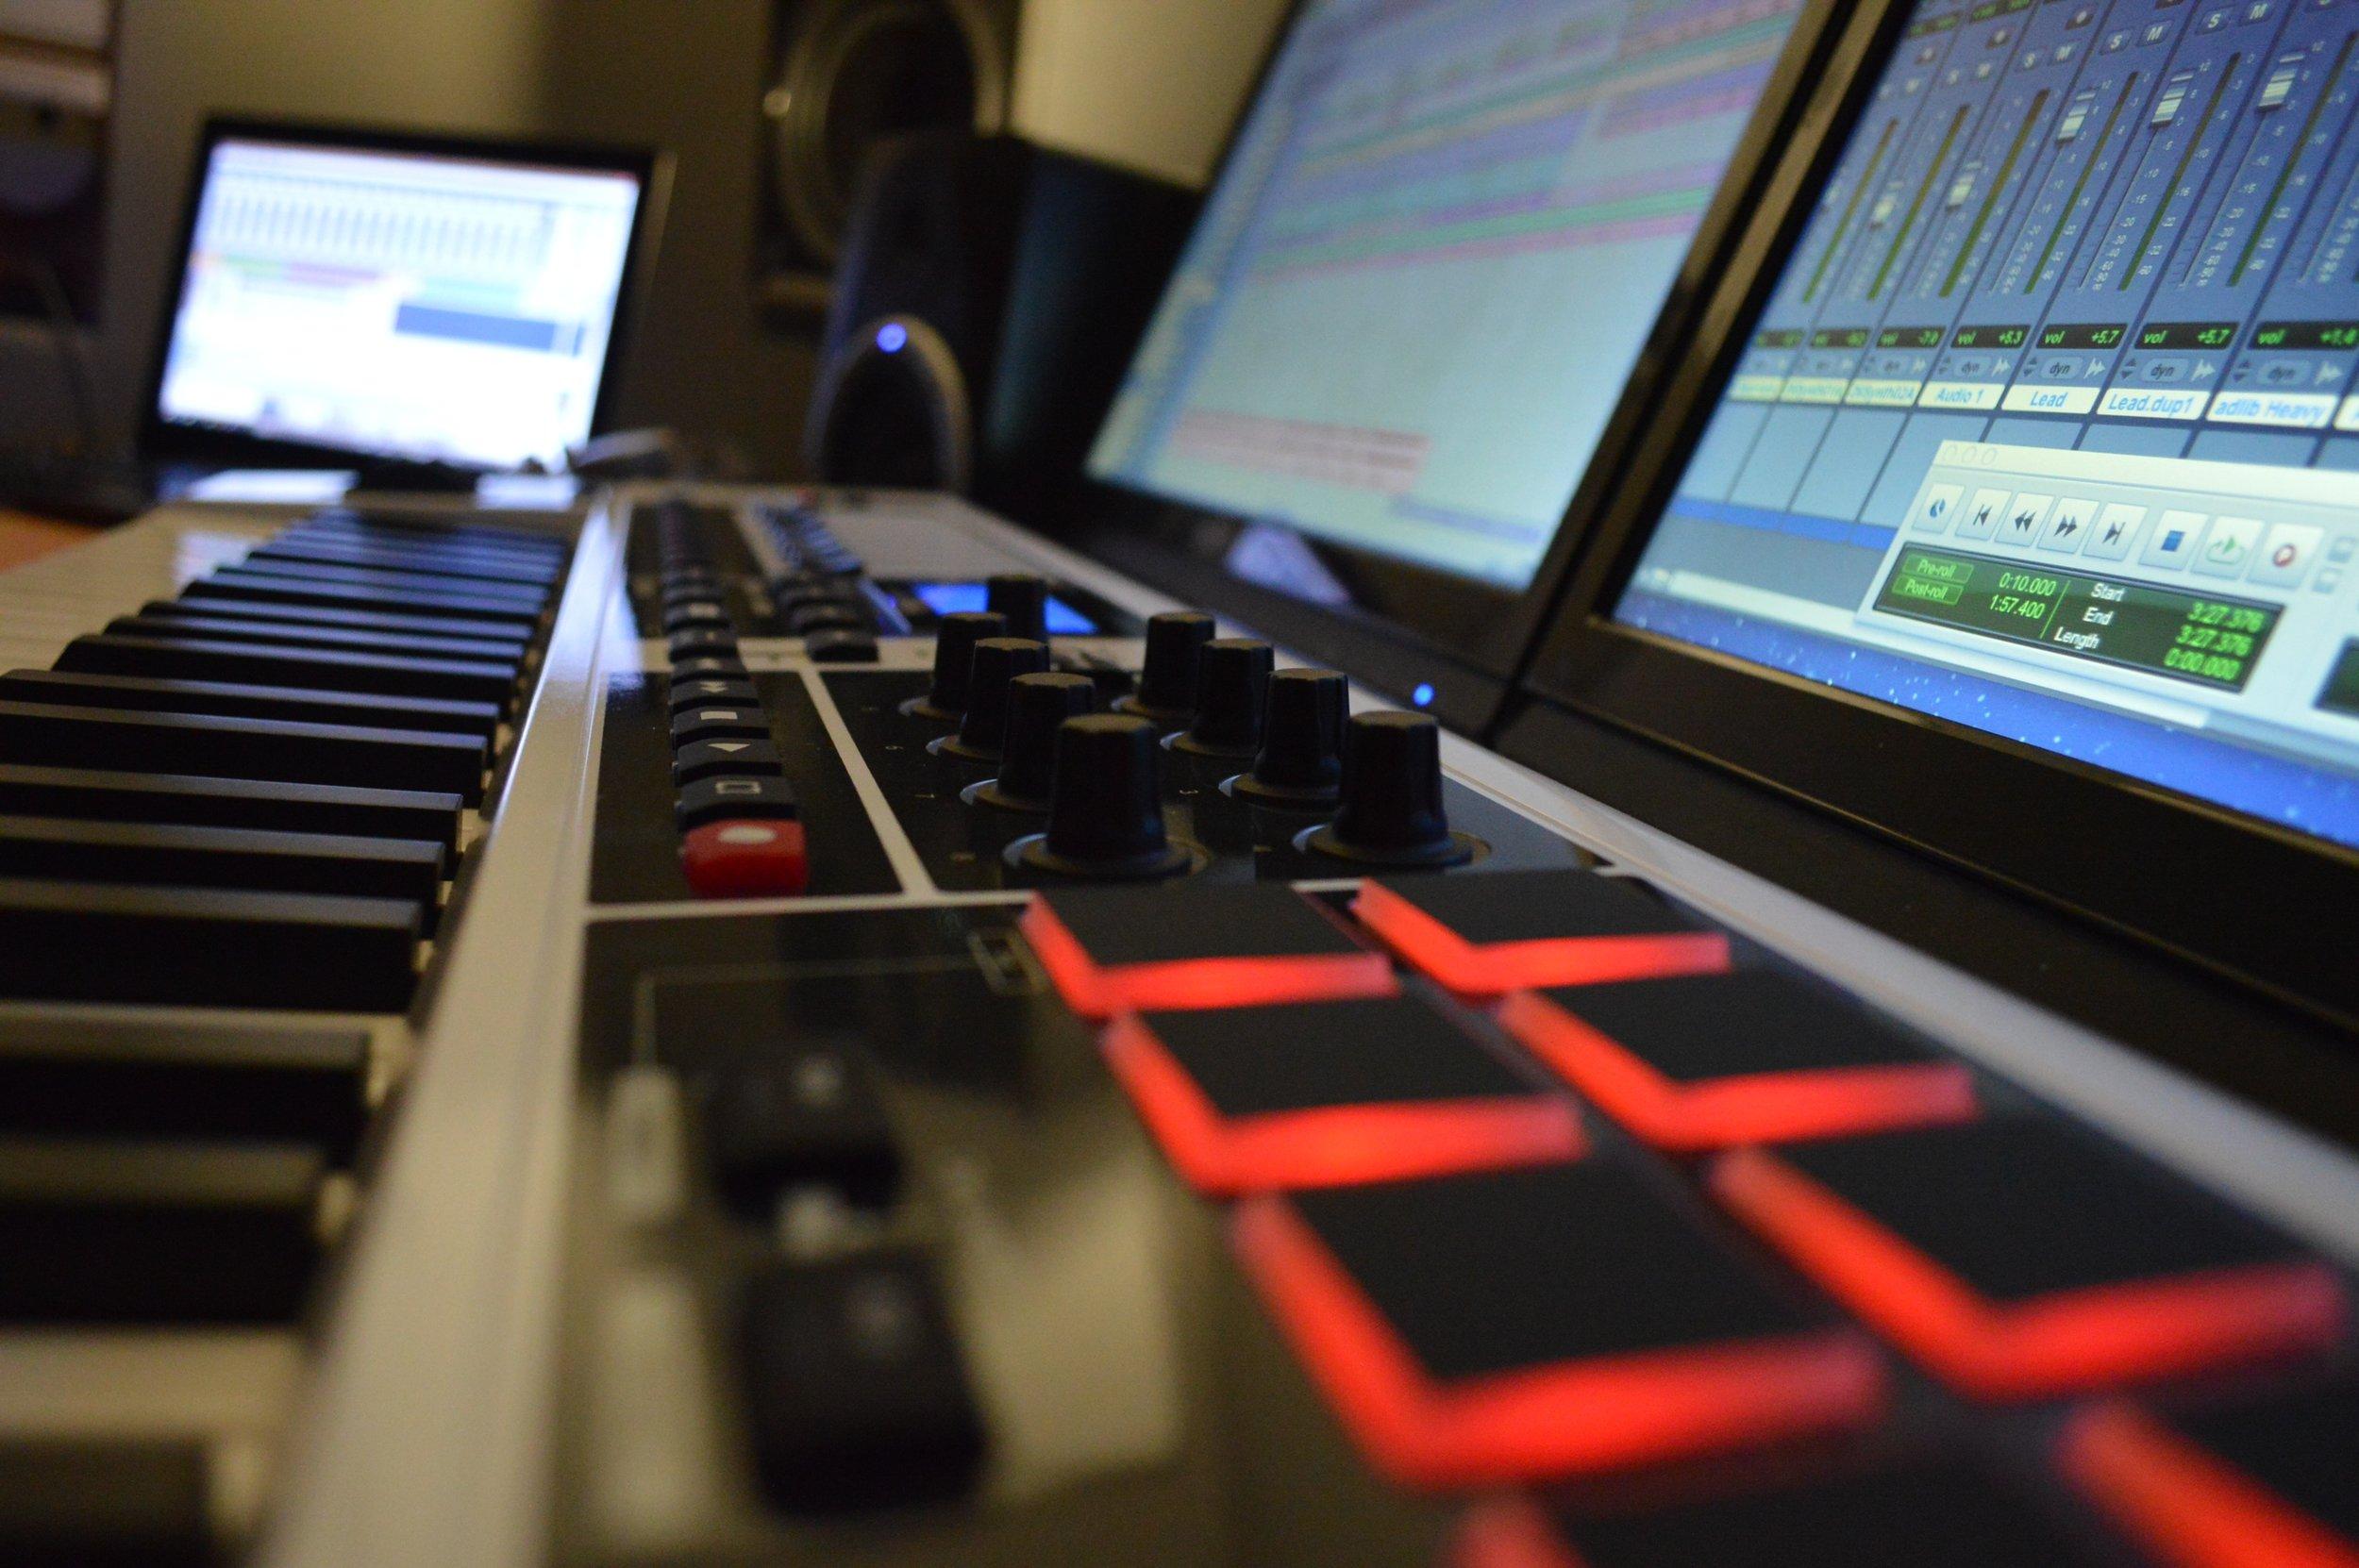 technology-design-editing-personal-computer-personal-computer-hardware-audio-engineer-102475-pxhere.com.jpg